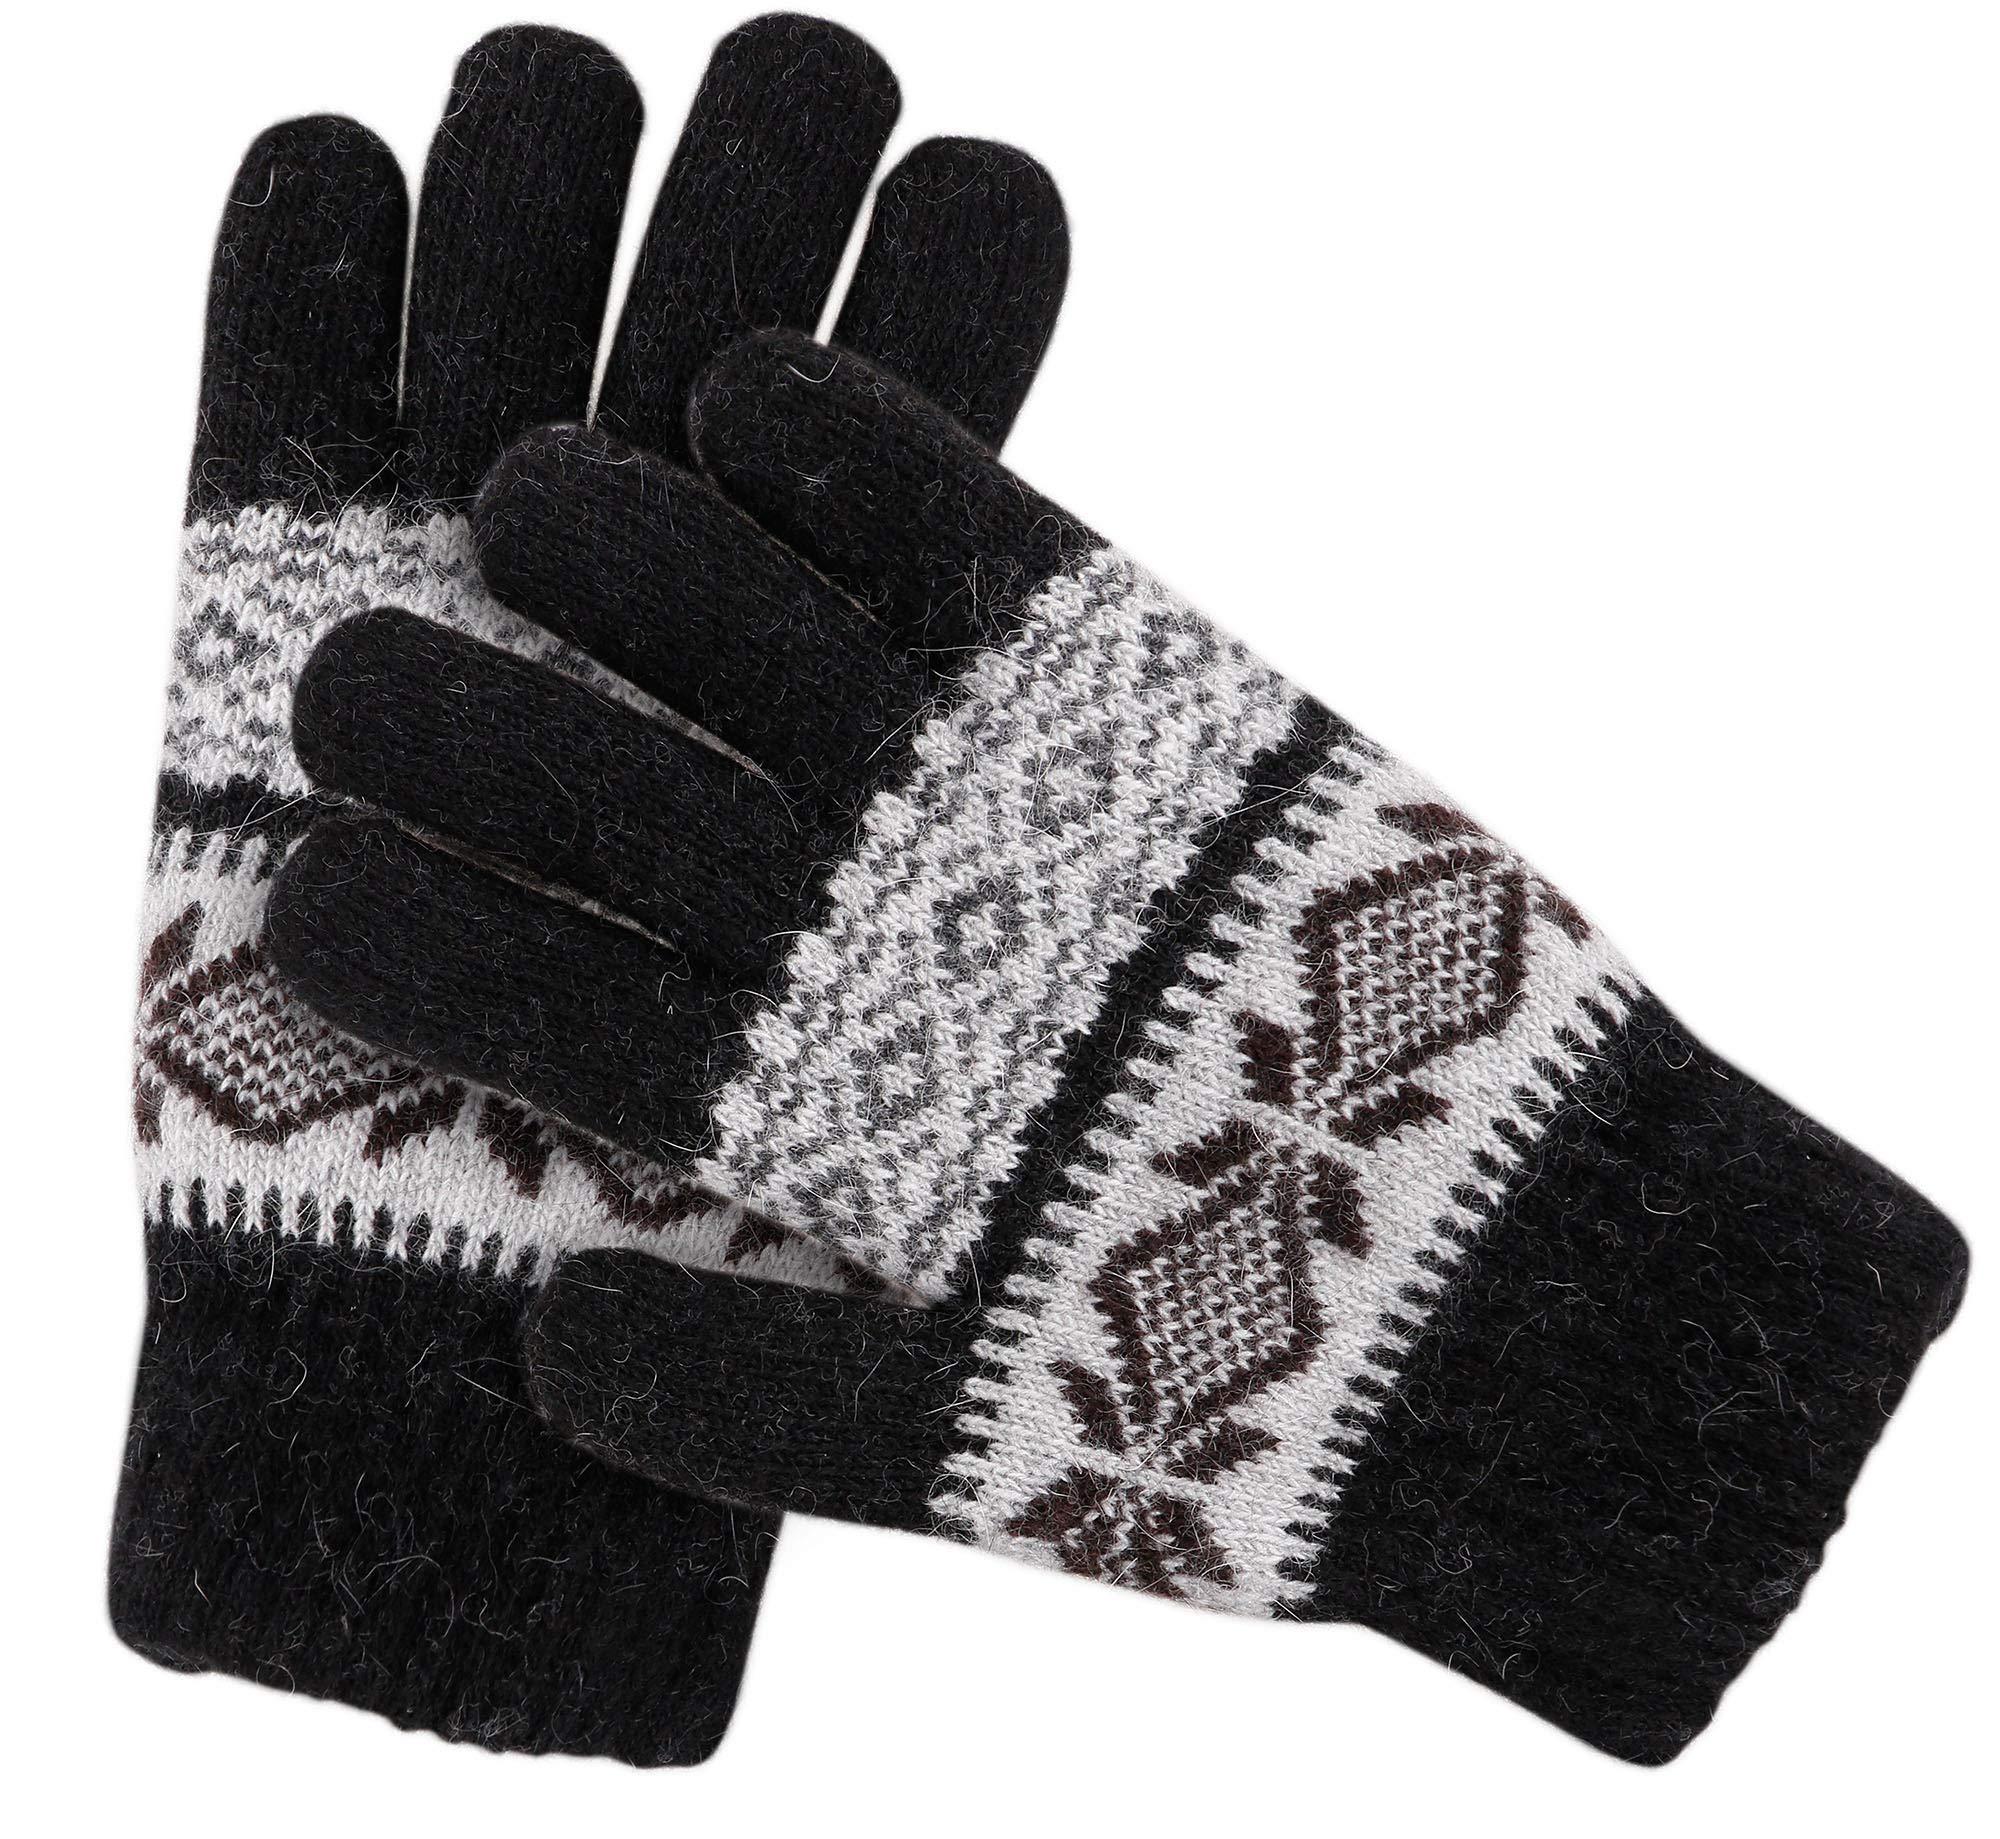 Knit Mittens Women S Winter Snowflake Sherpa Lined Gloves